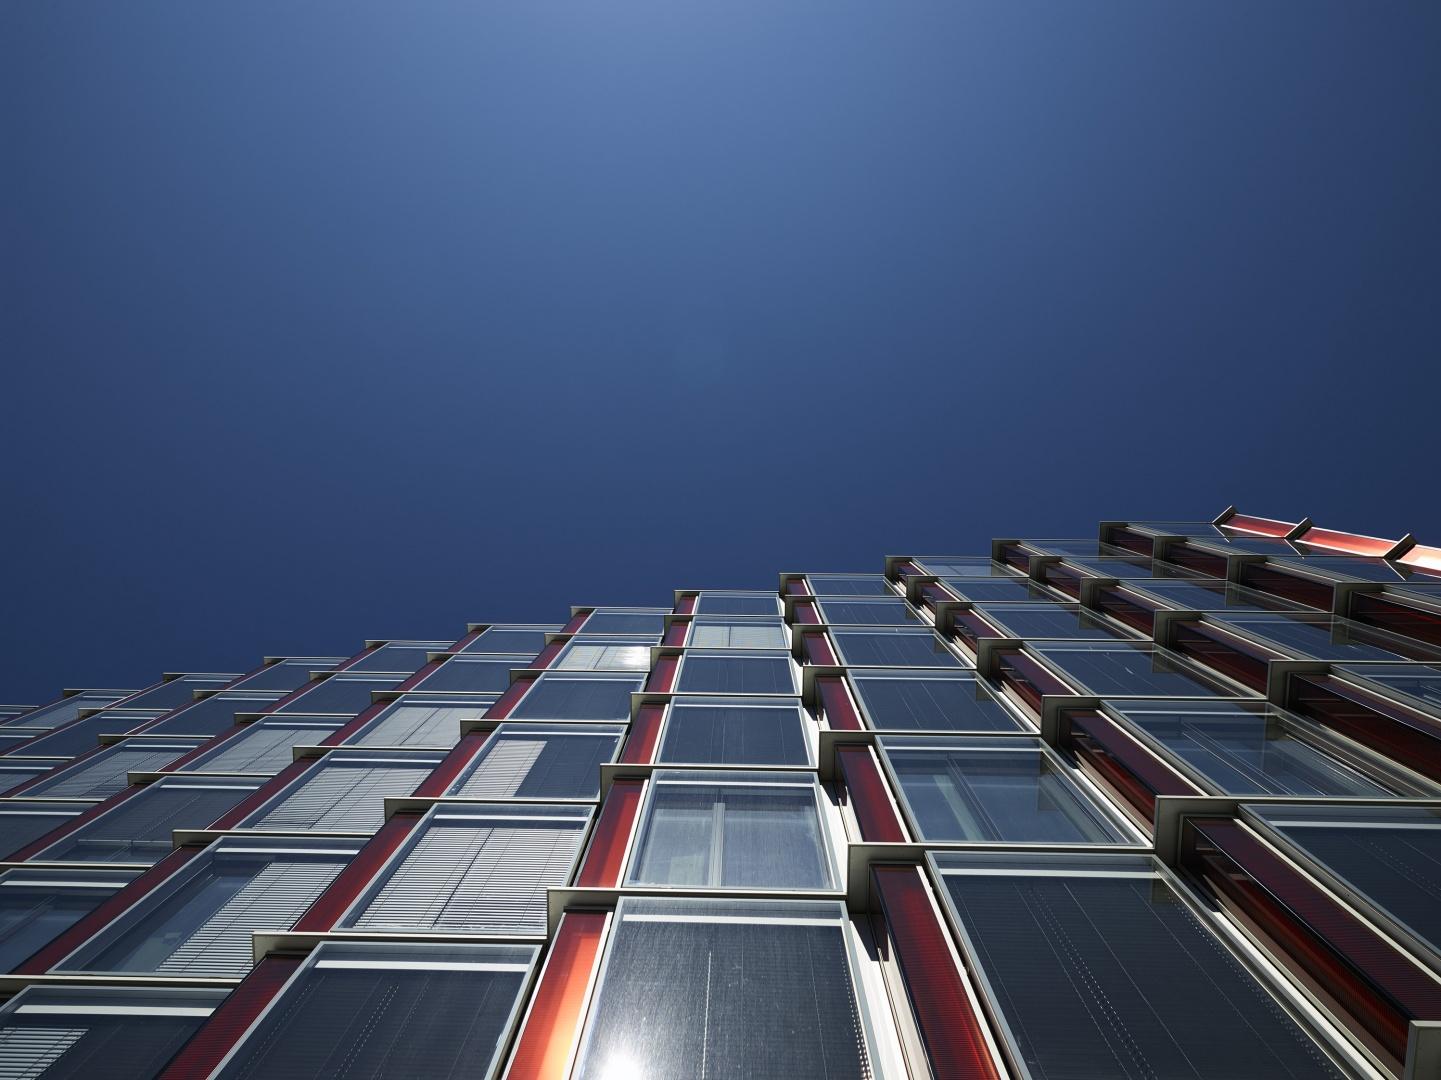 Fassadendetail © Fabio Fossati - Architectes SA